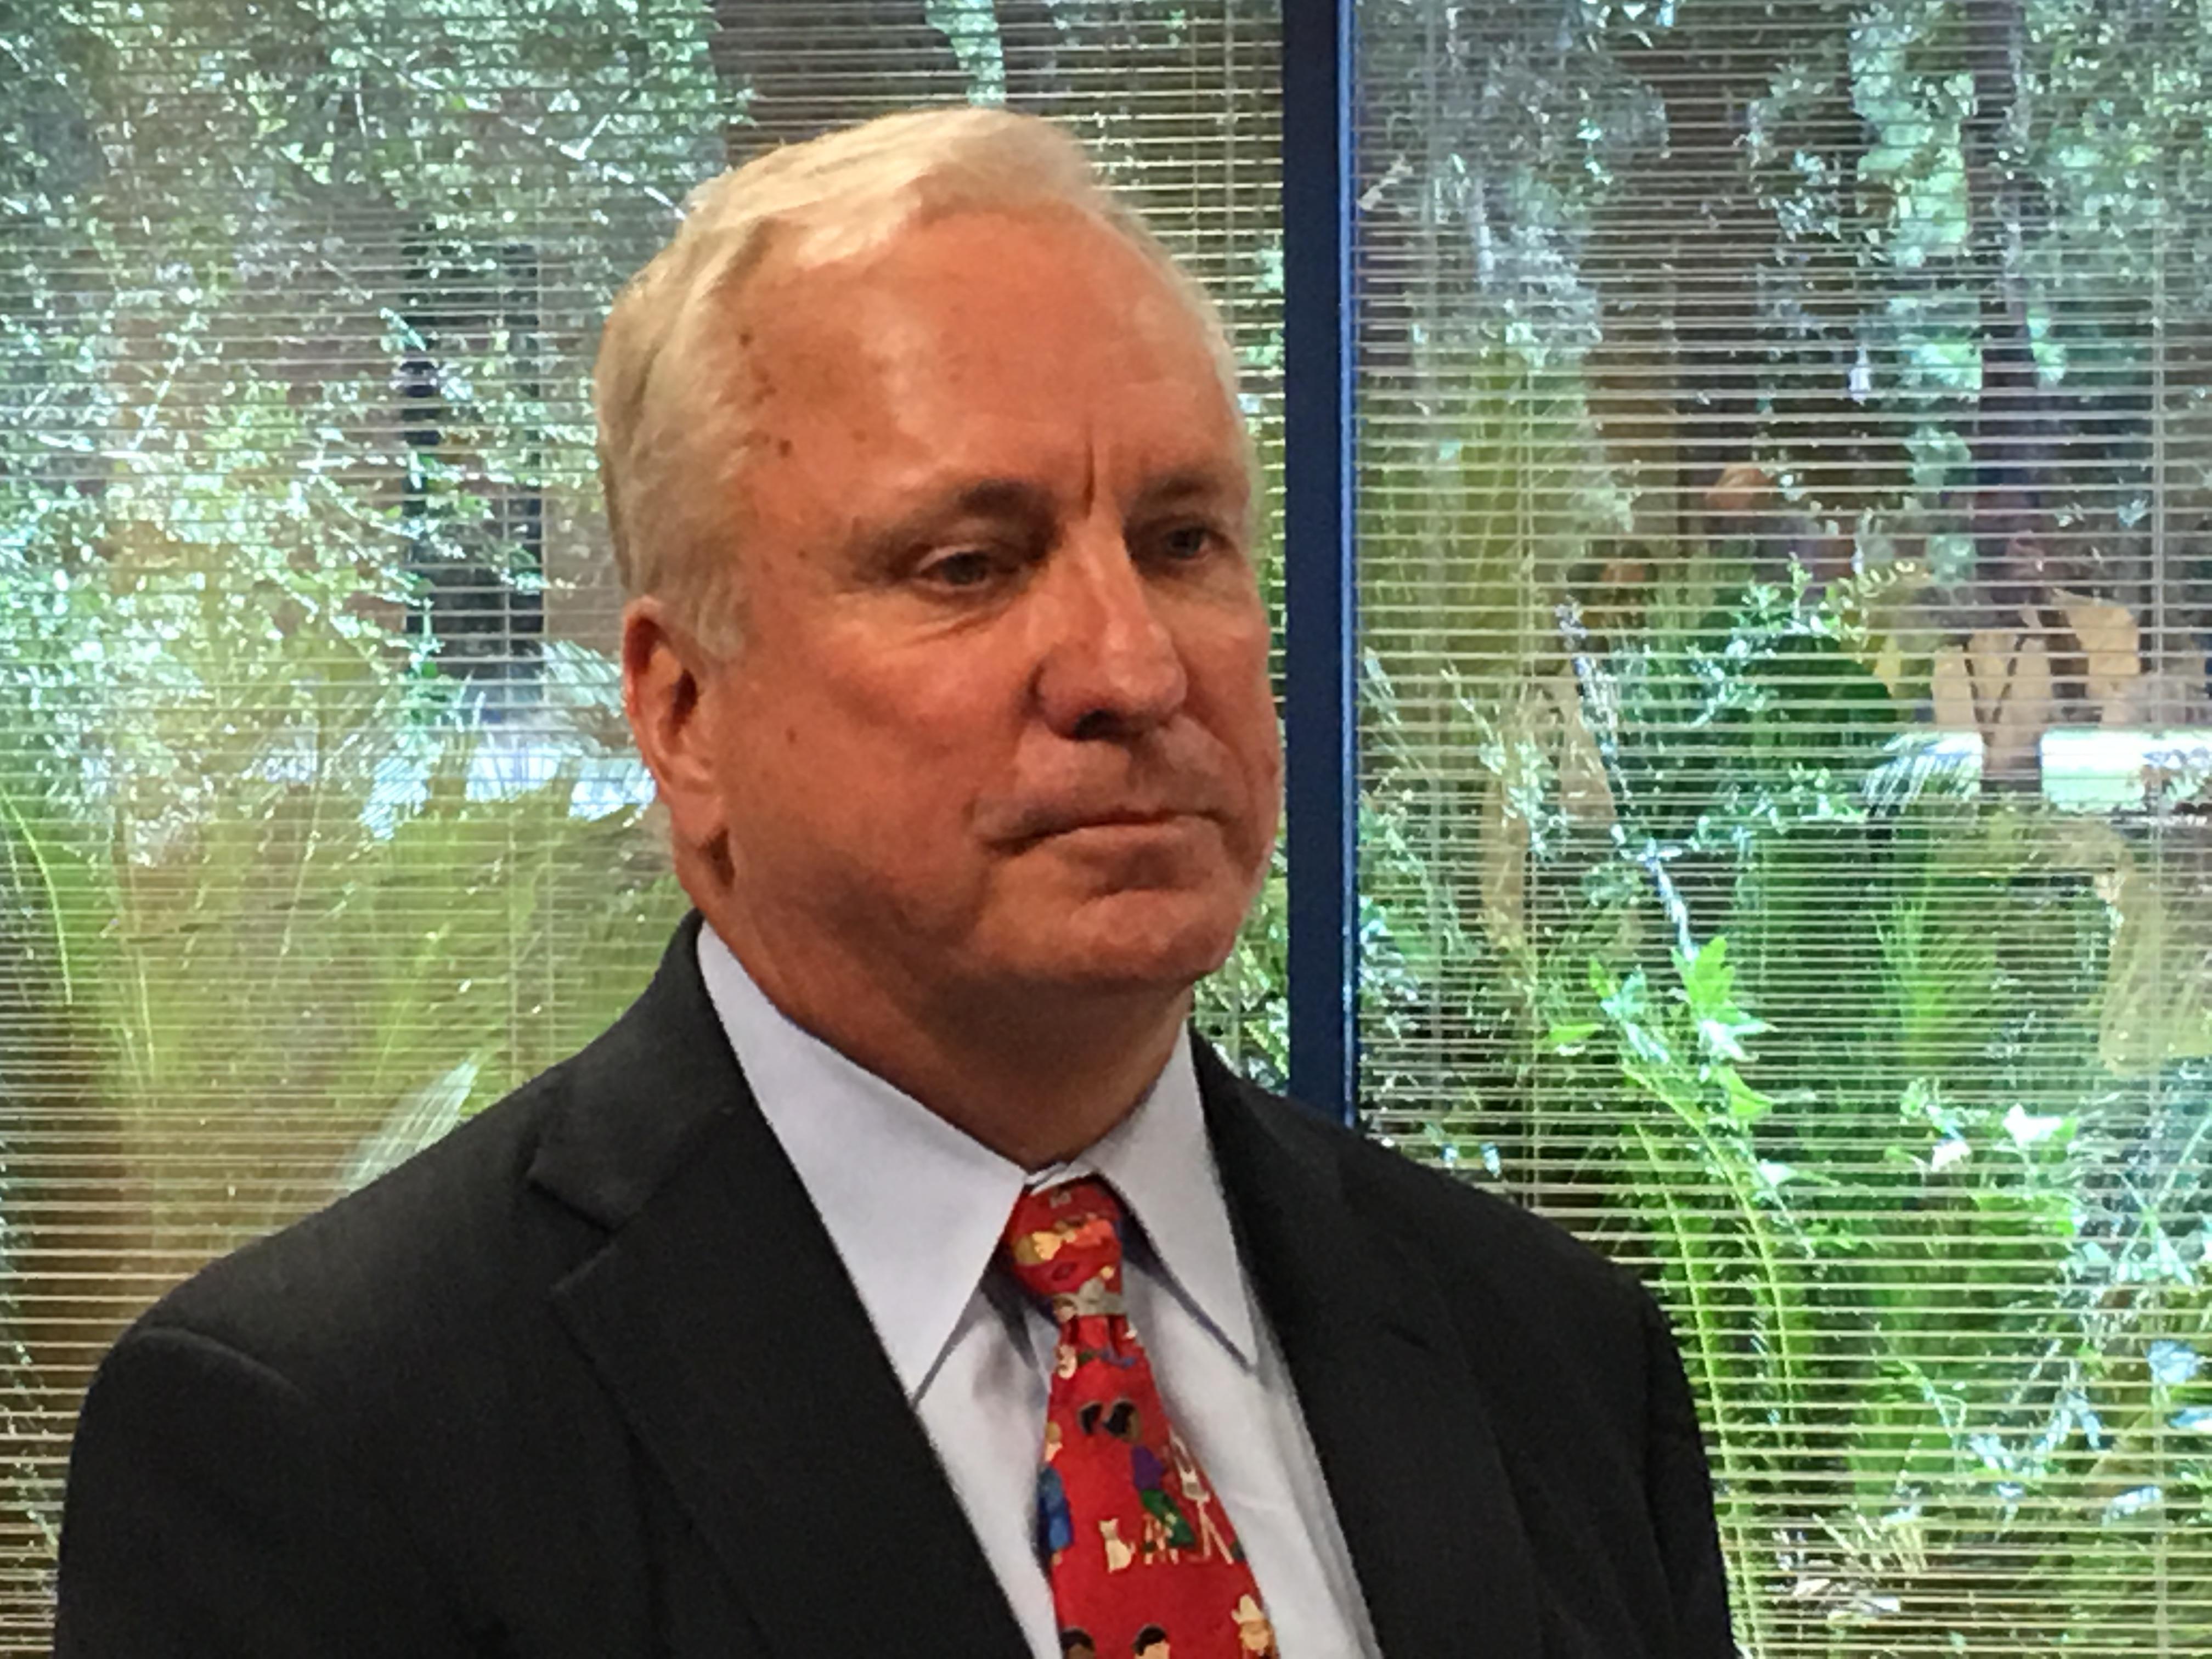 jax archives page of florida politics